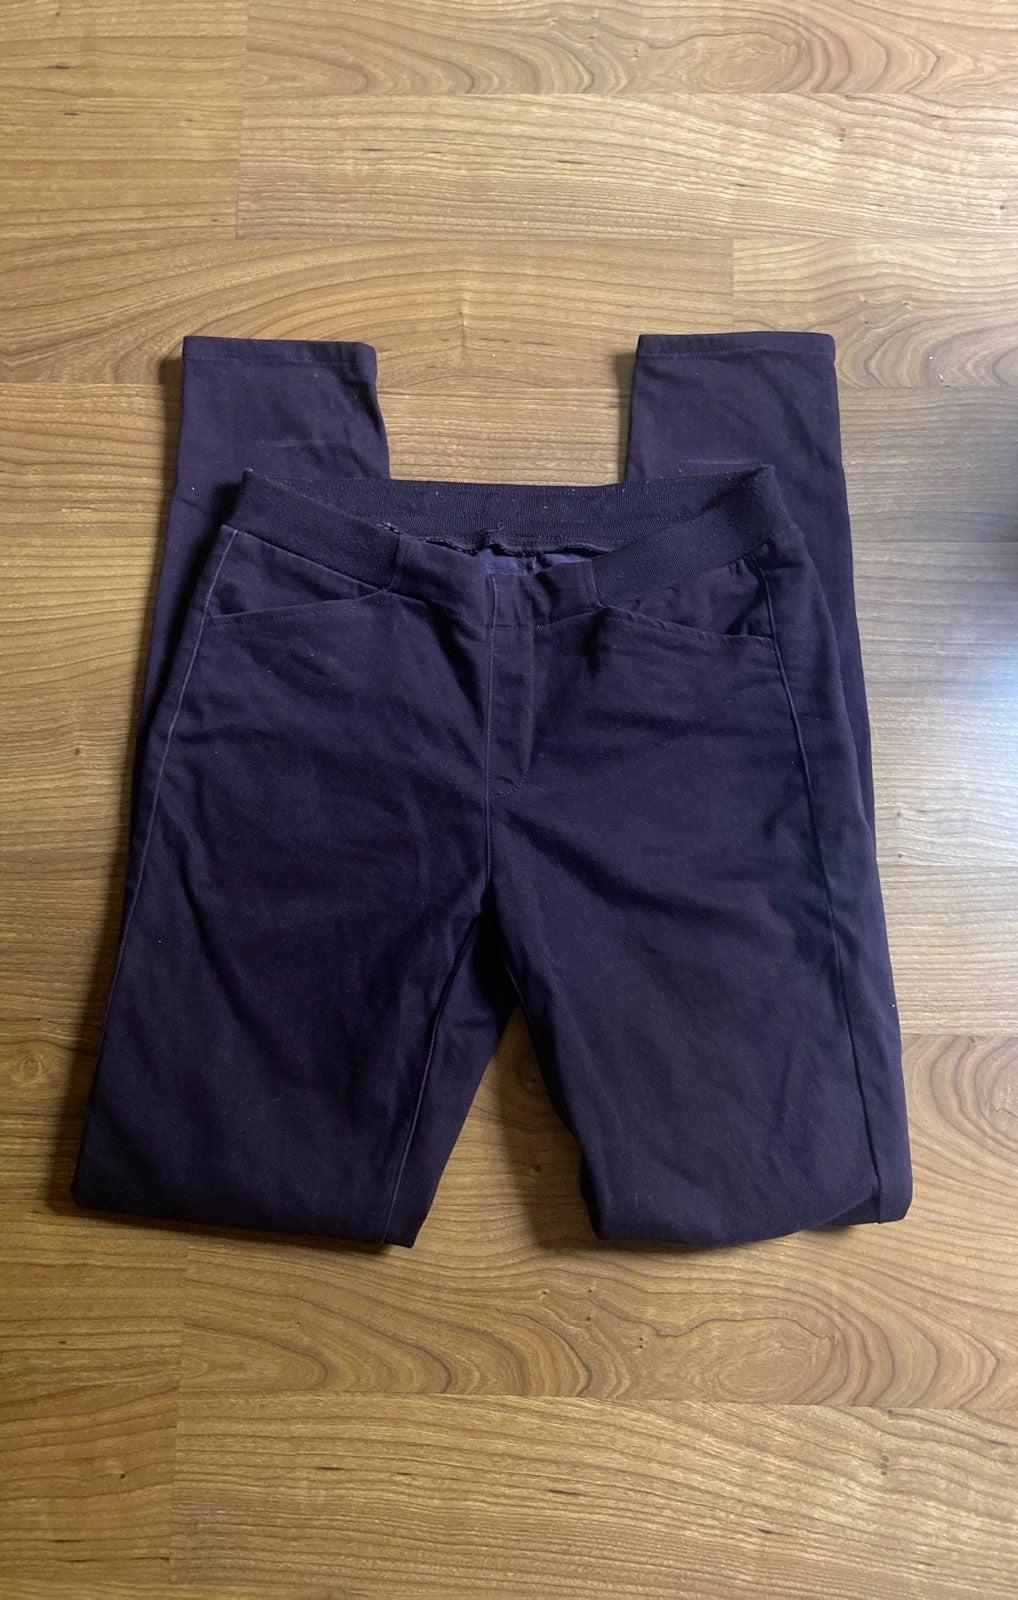 Uniqlo Jean Like Pants